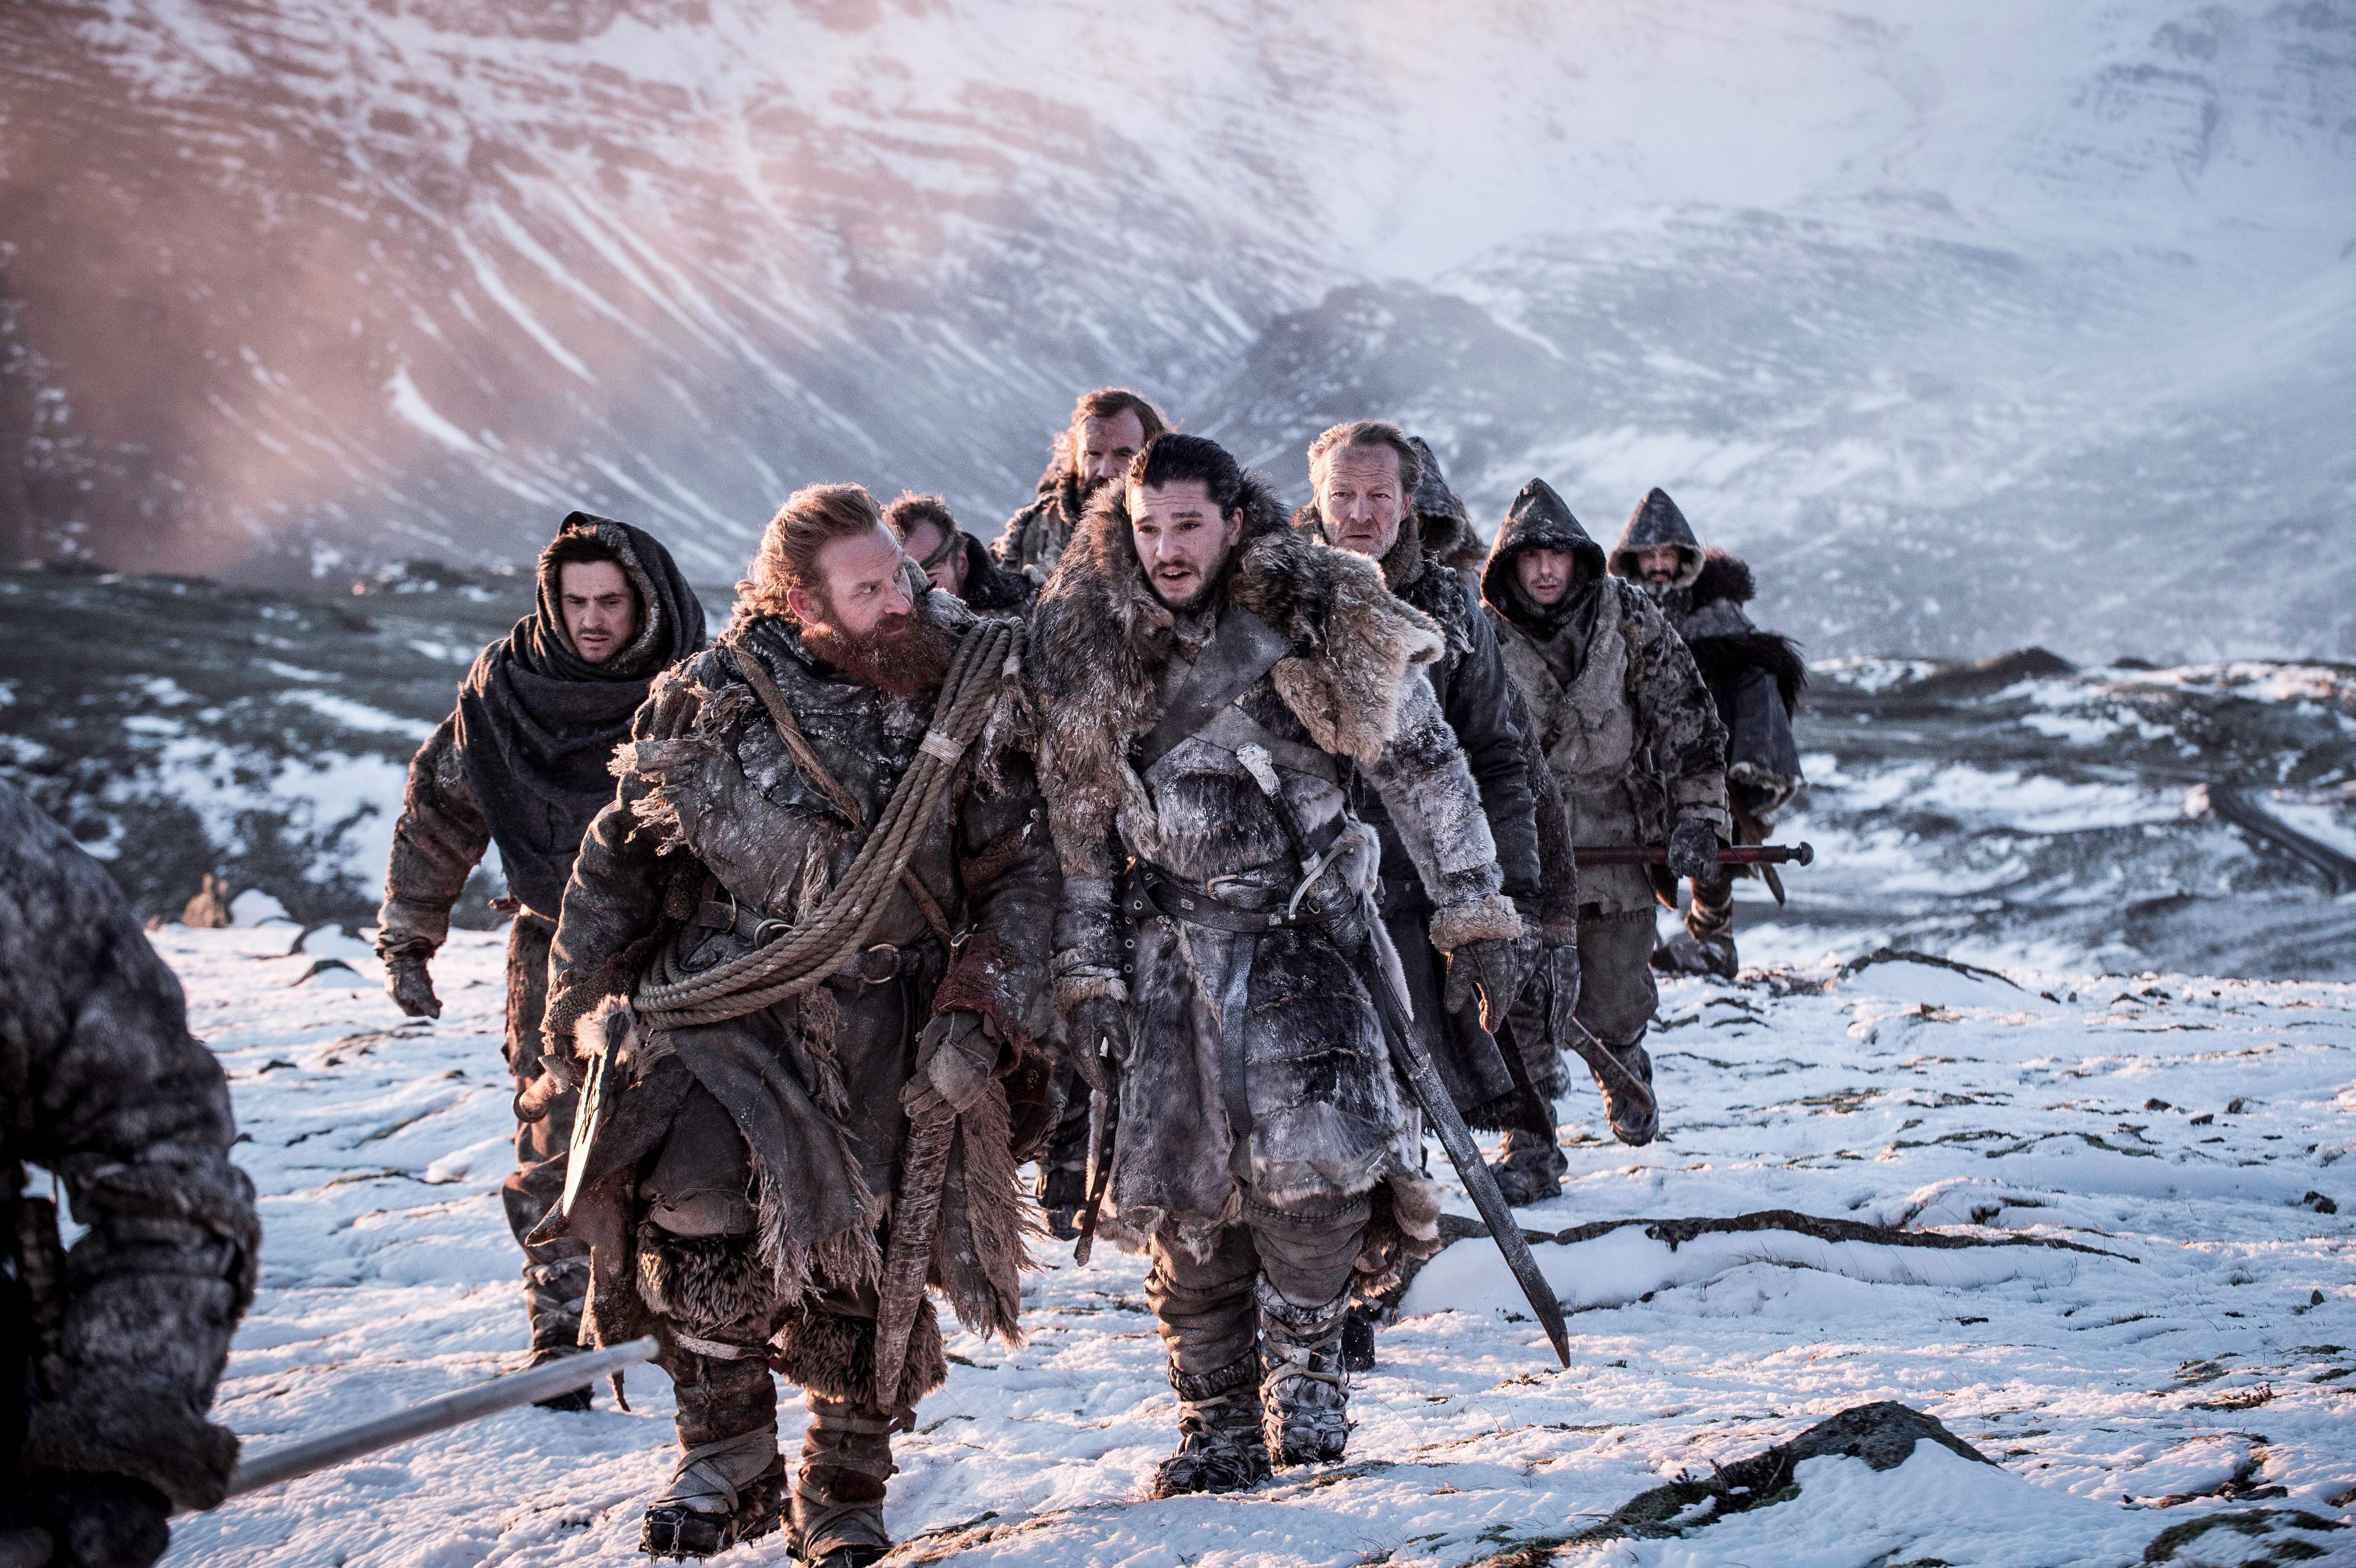 Game Of Thrones Wallpaper Android: 240x320 Game Of Thrones Season 7 2017 Nokia 230, Nokia 215